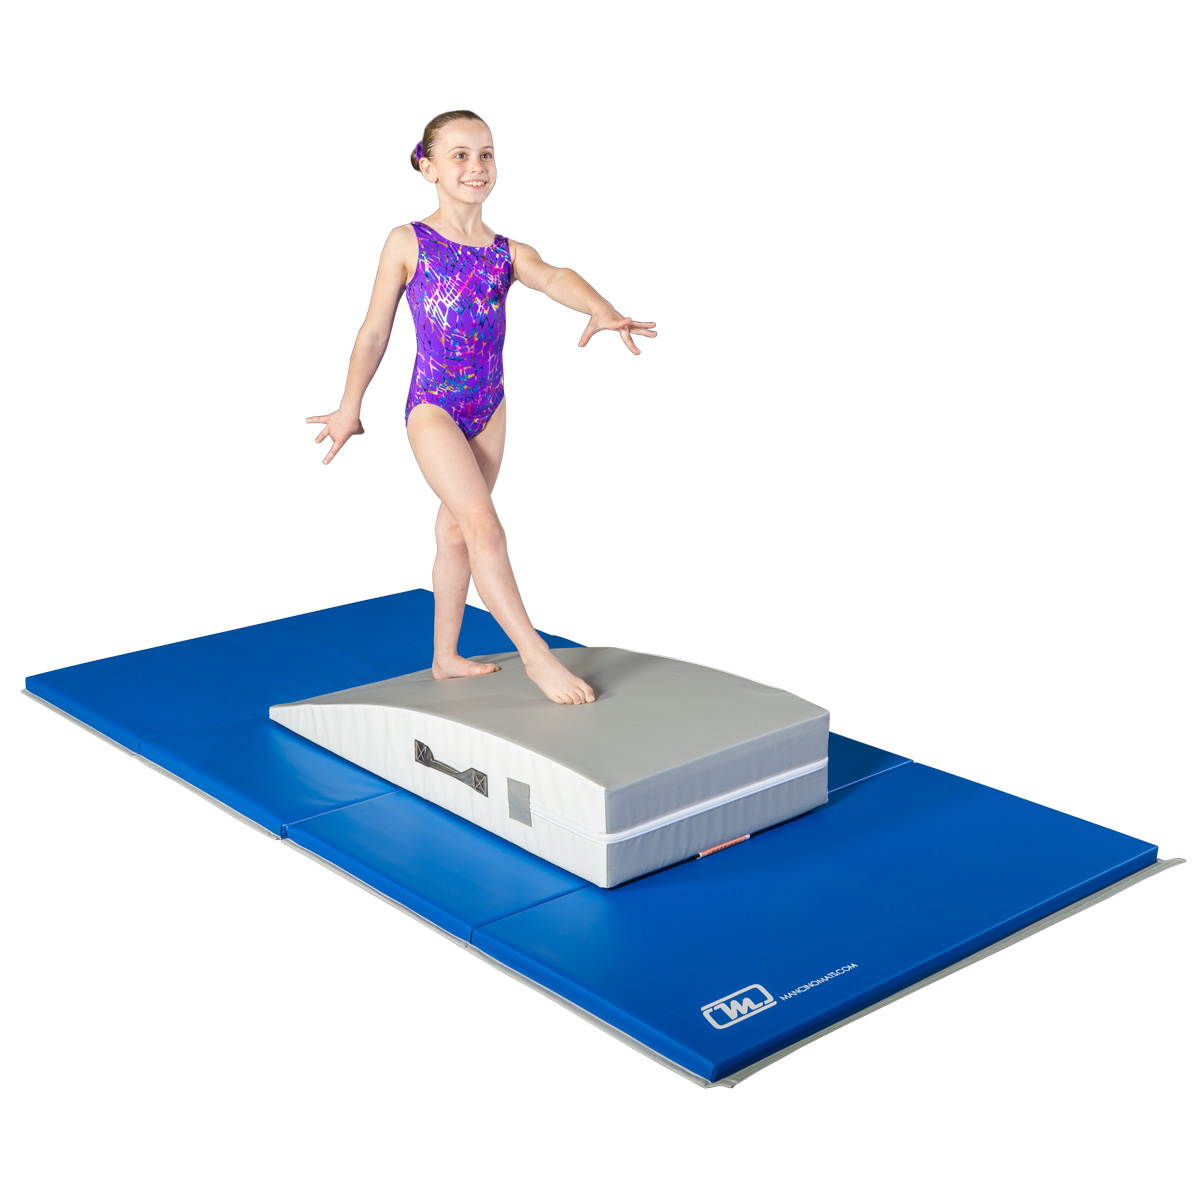 gymnast on folding panel mat with mount block